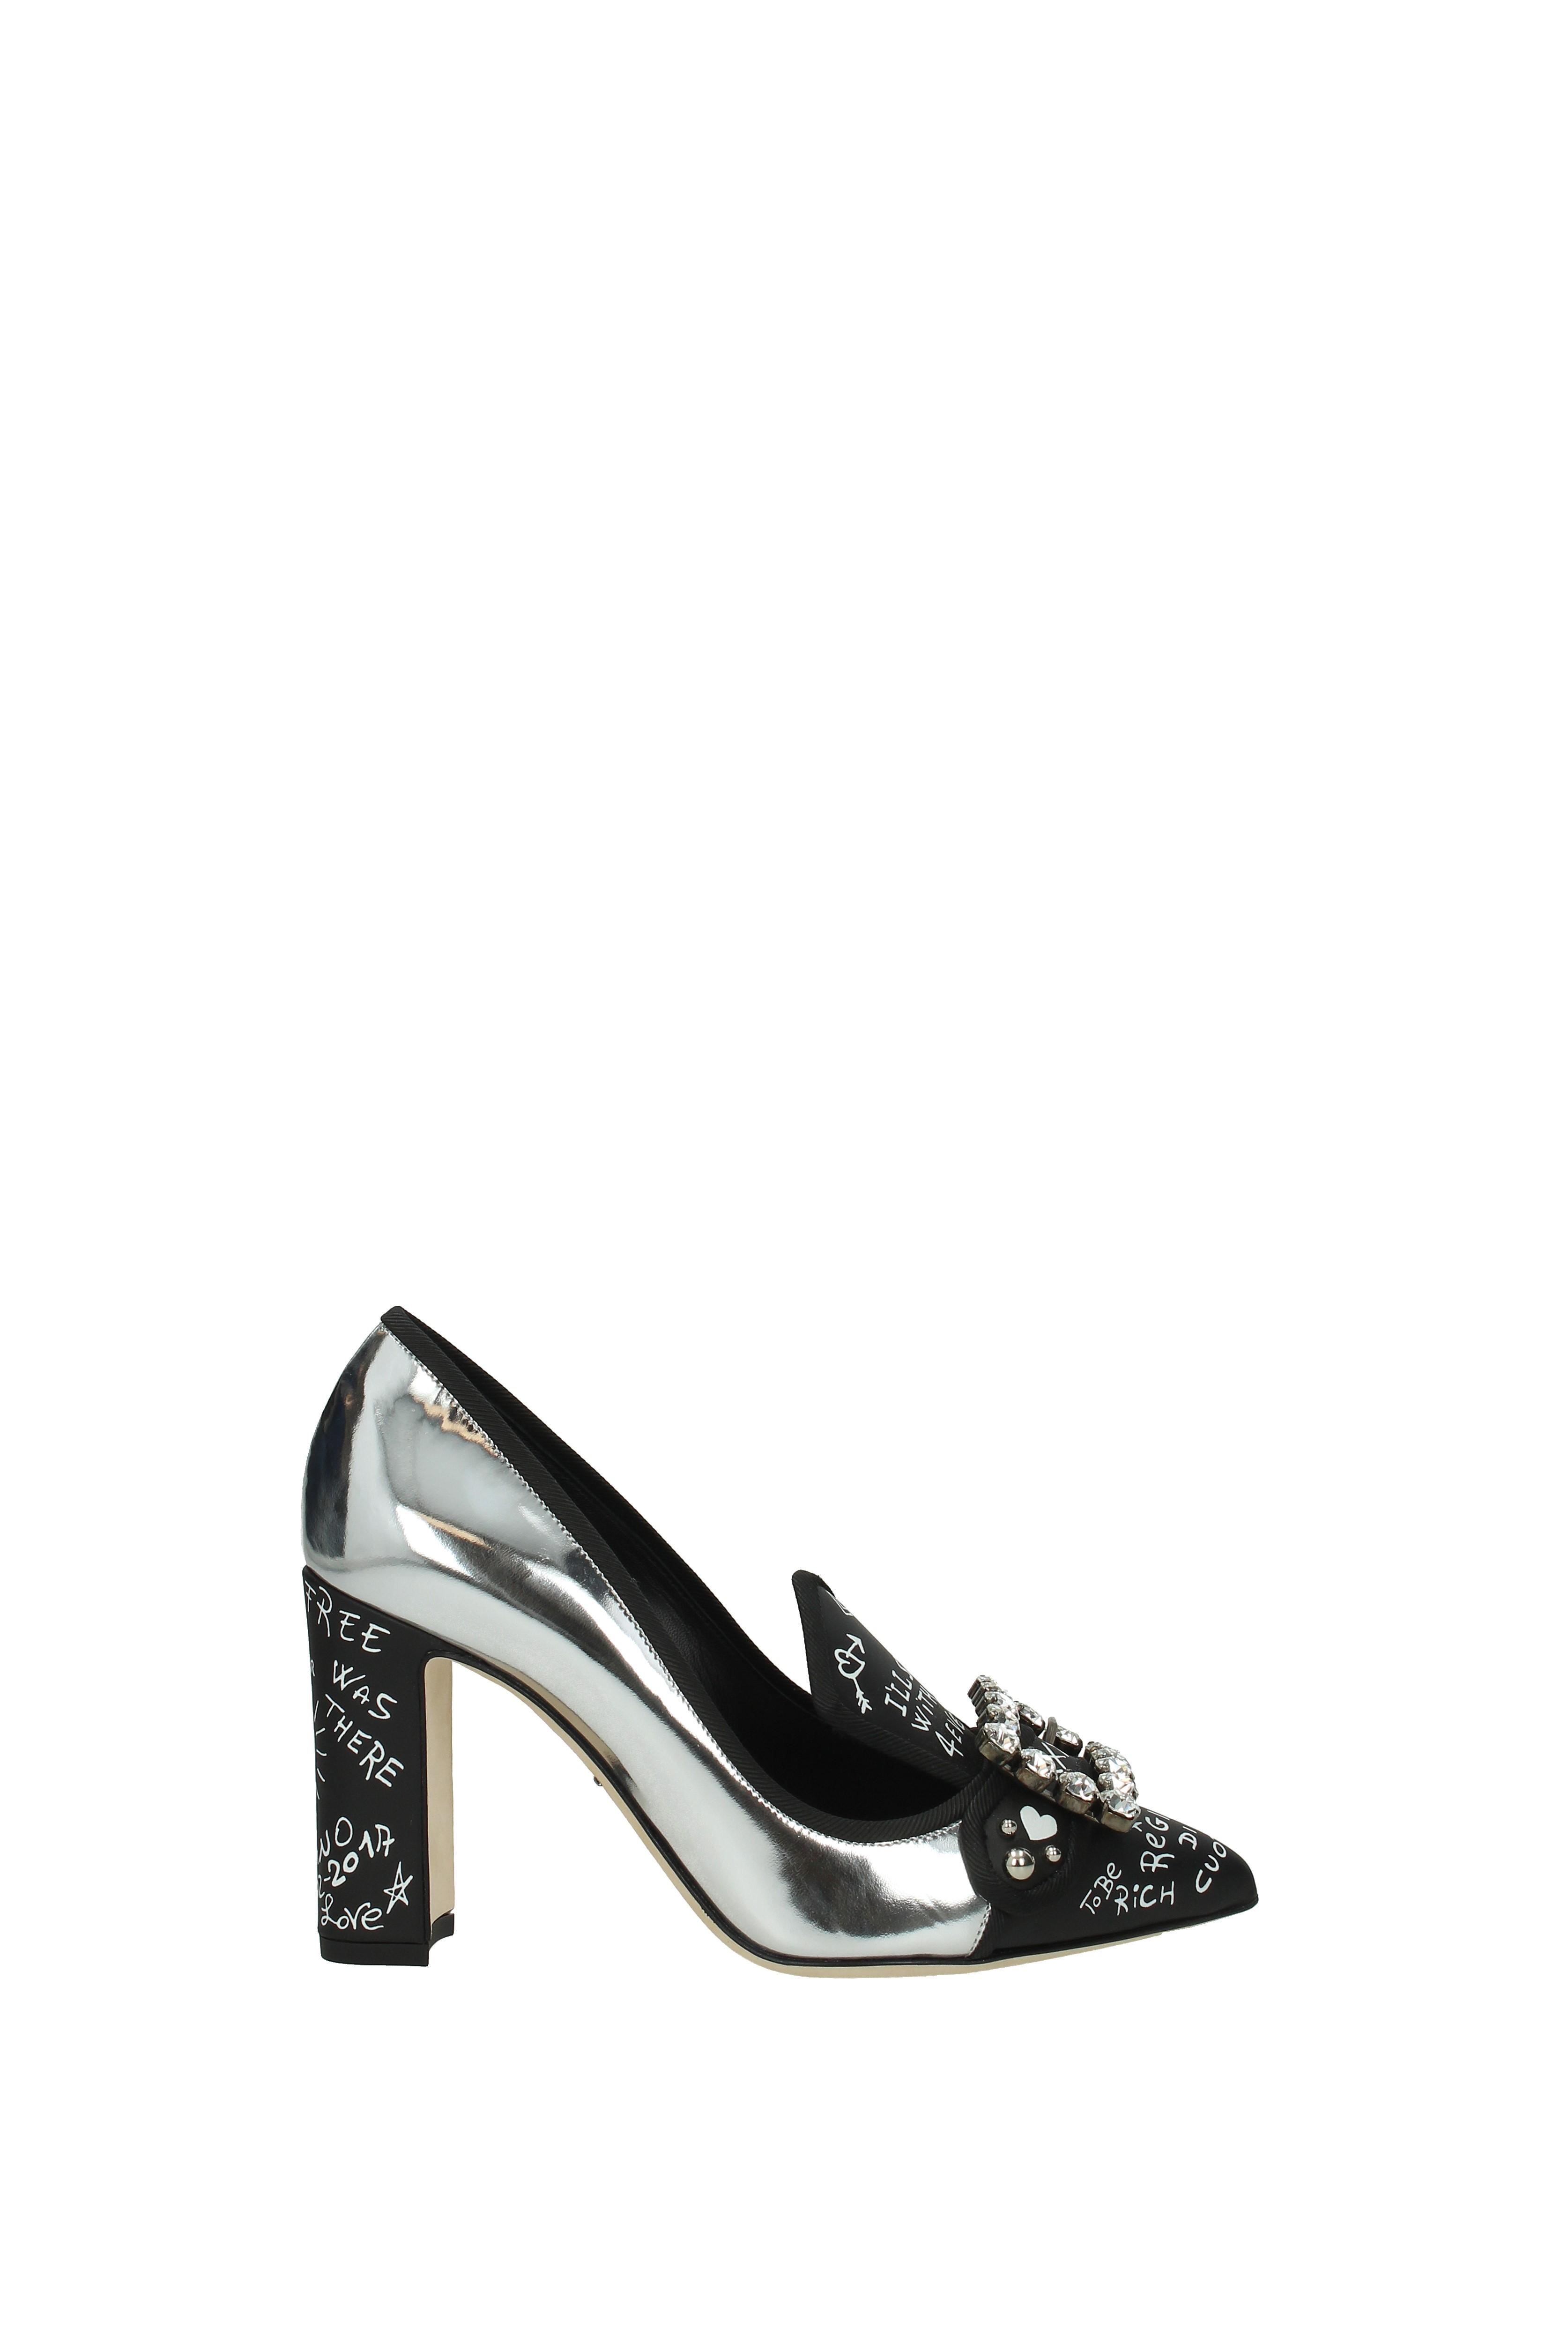 Pumps (CD0935AM948) Dolce&Gabbana Damen - Lackleder (CD0935AM948) Pumps d914f0